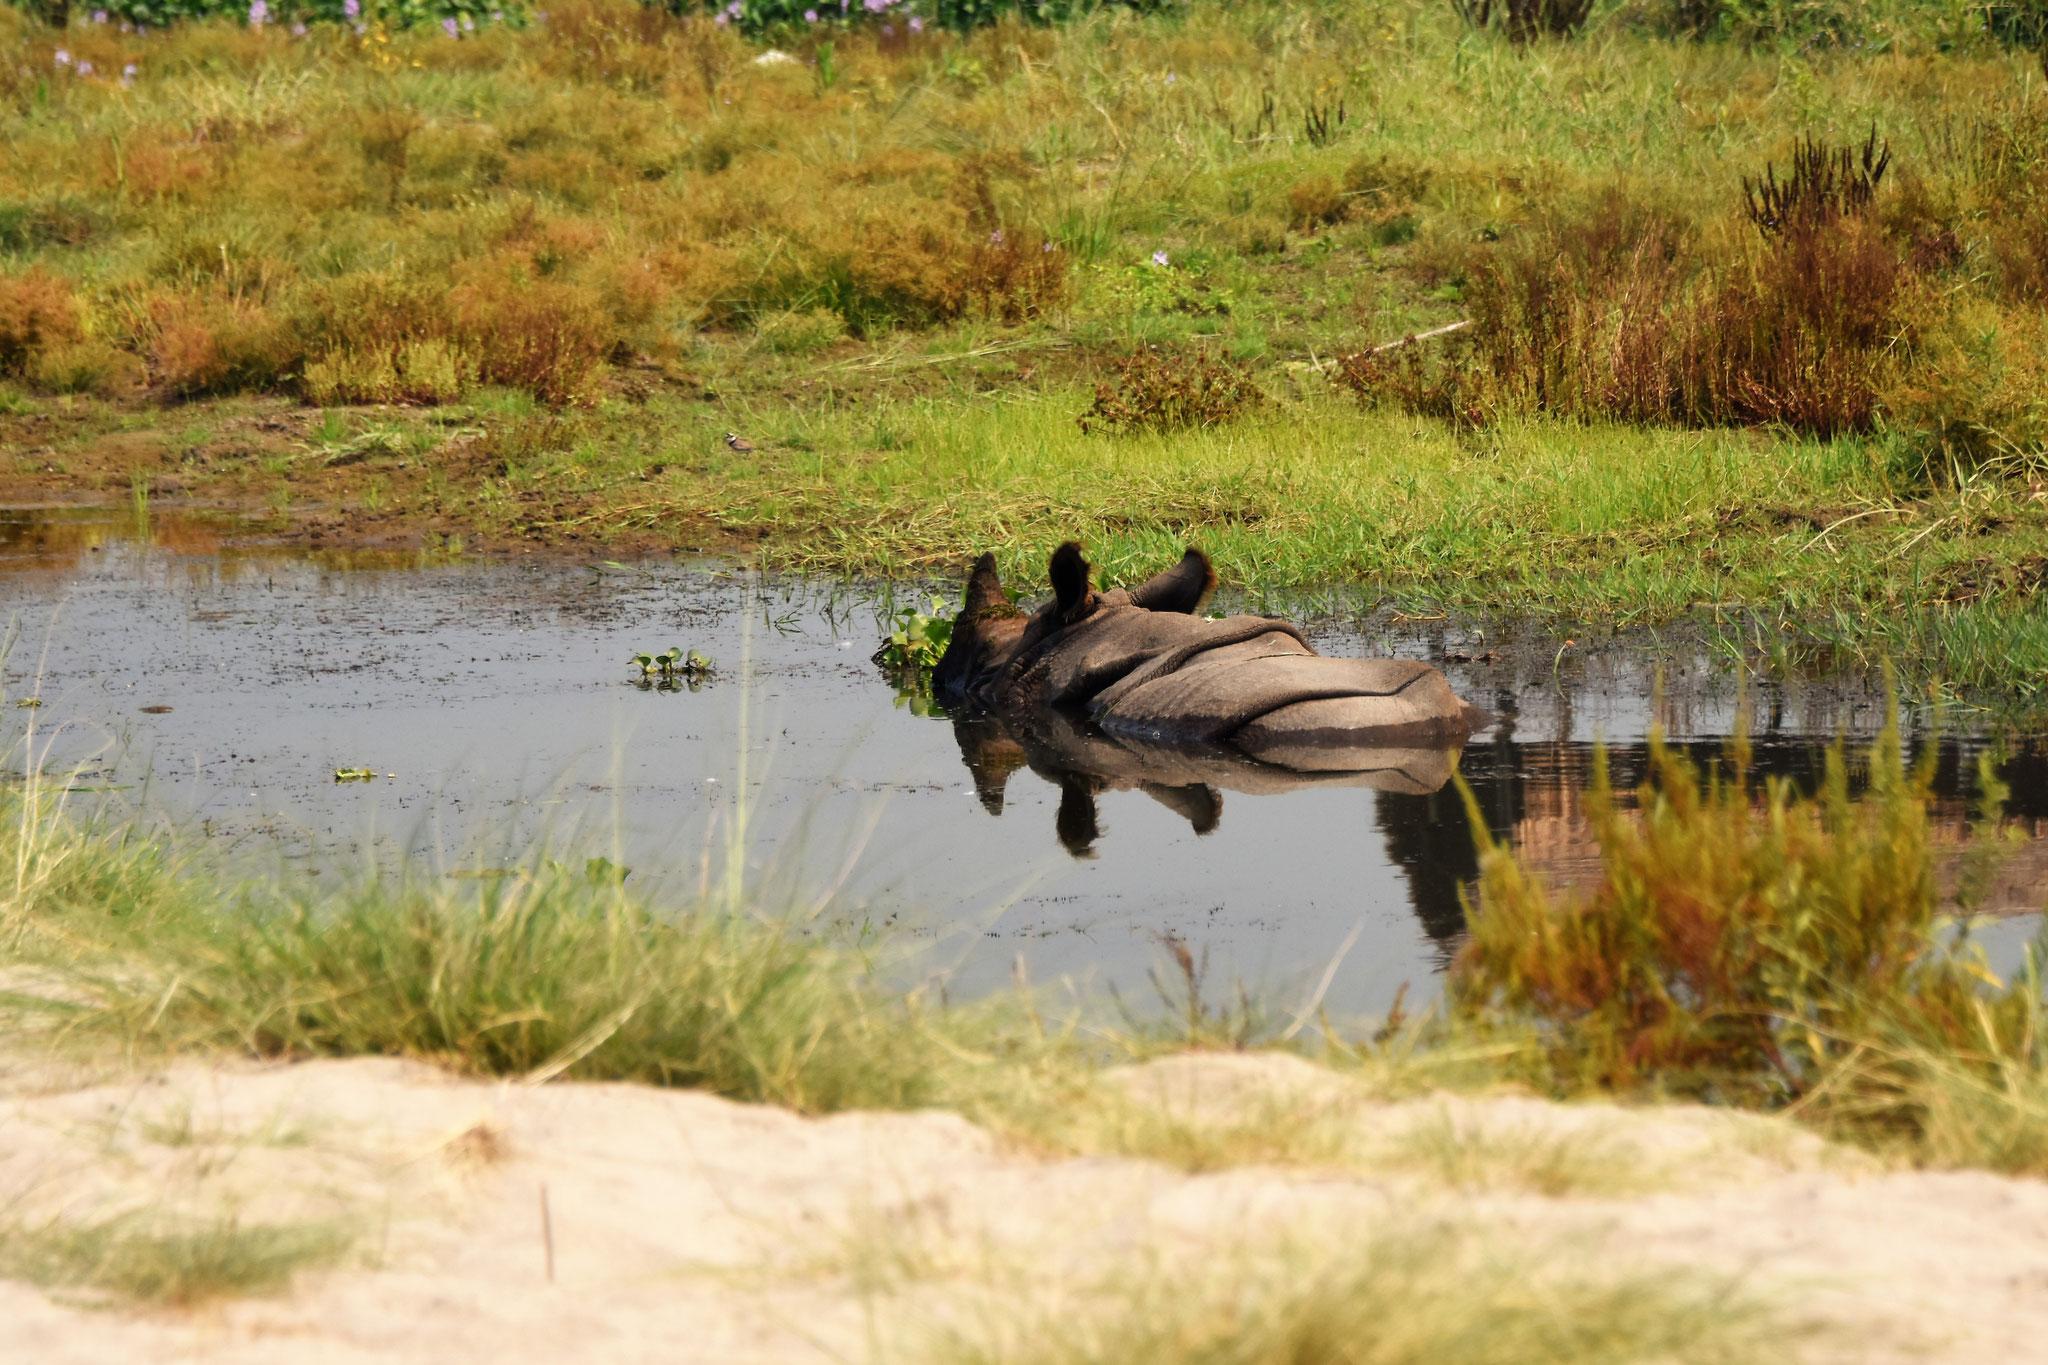 Nilpferd im Rapti-Fluss